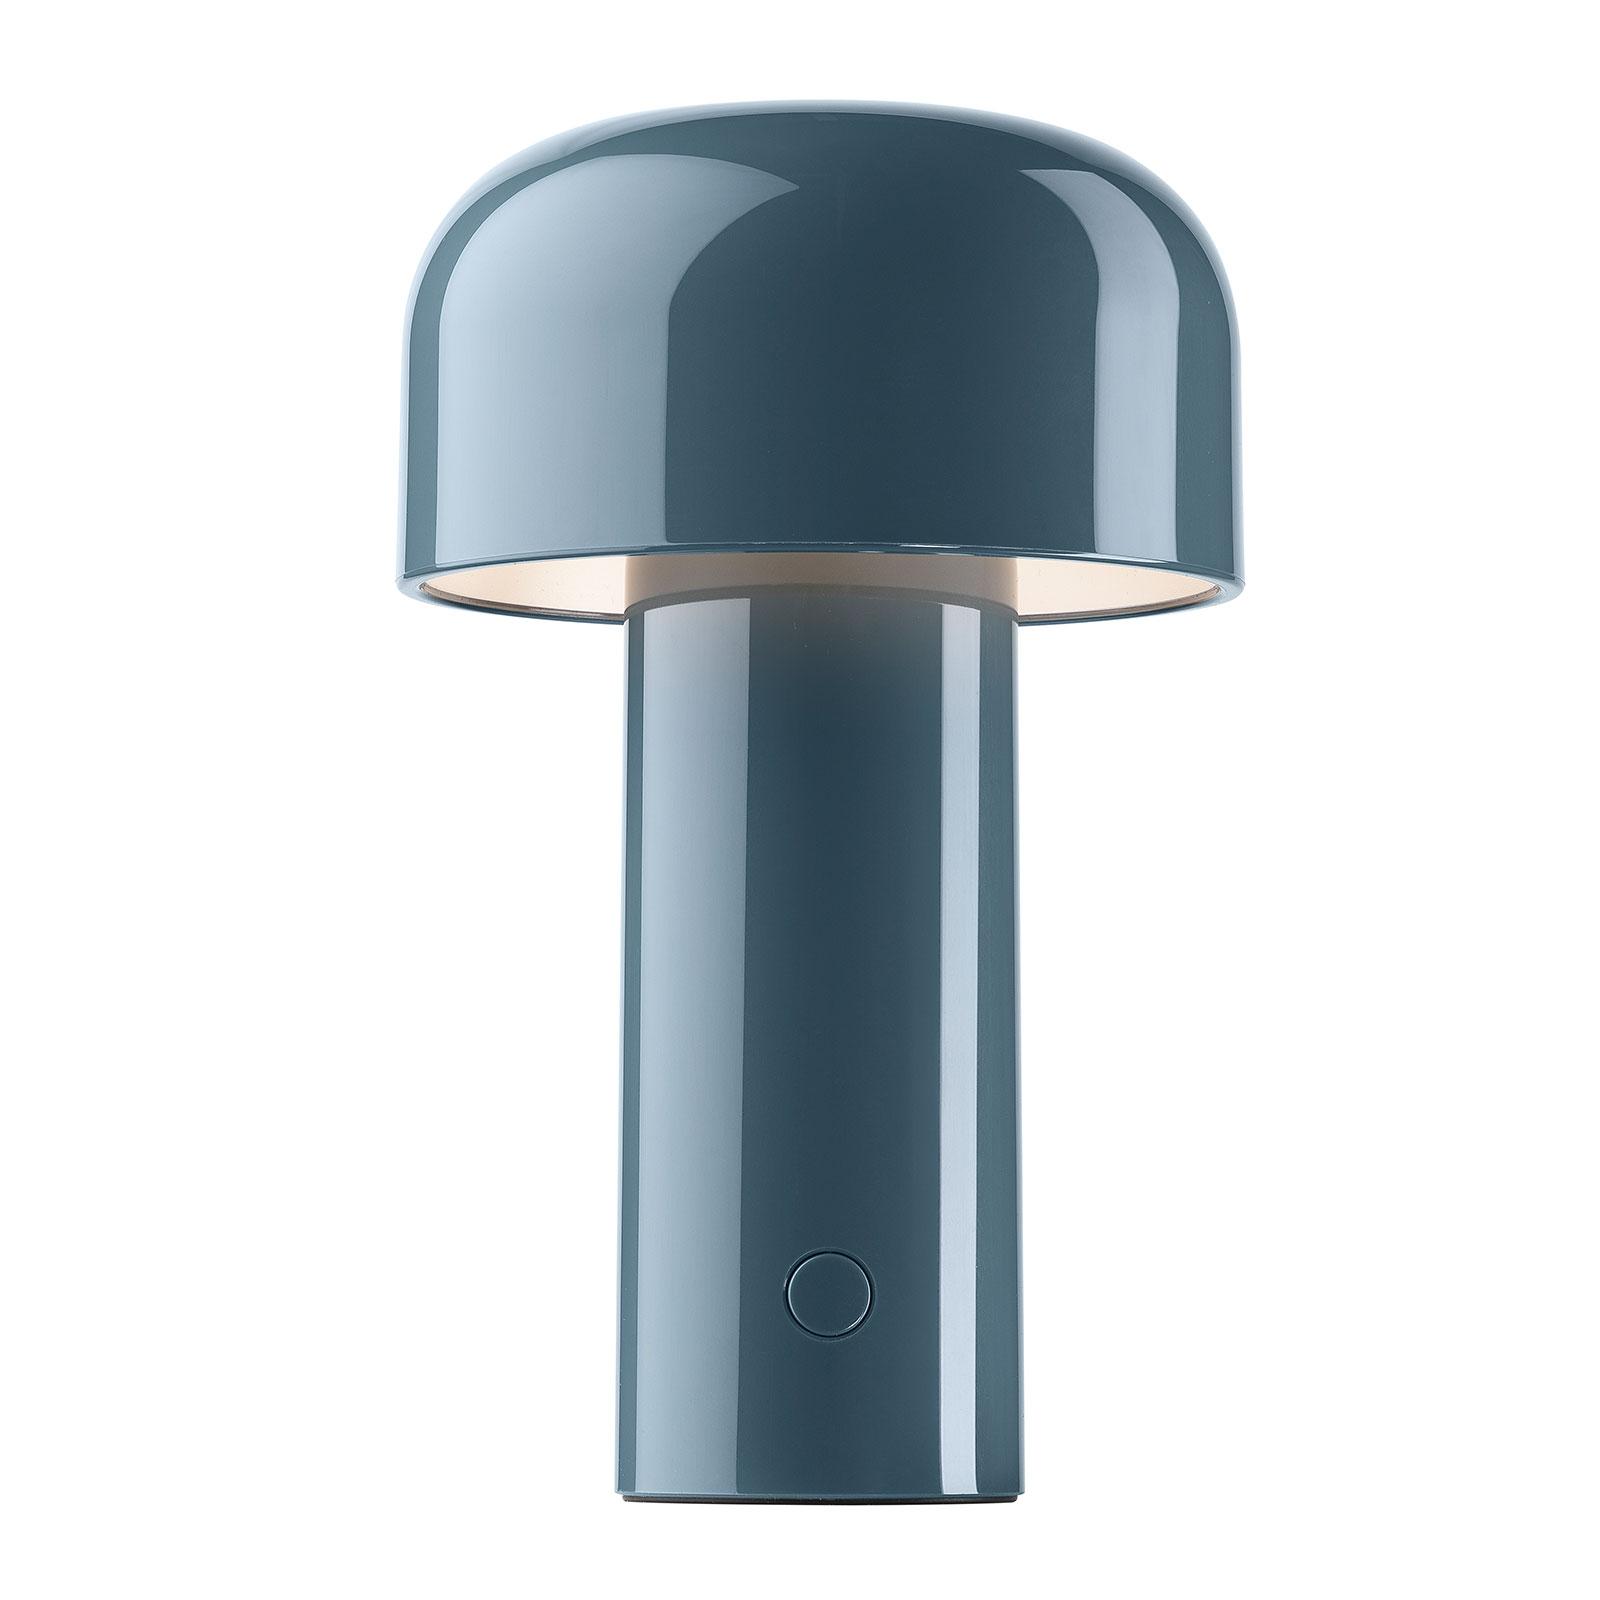 FLOS Bellhop ładowana lampa stołowa LED, niebieska